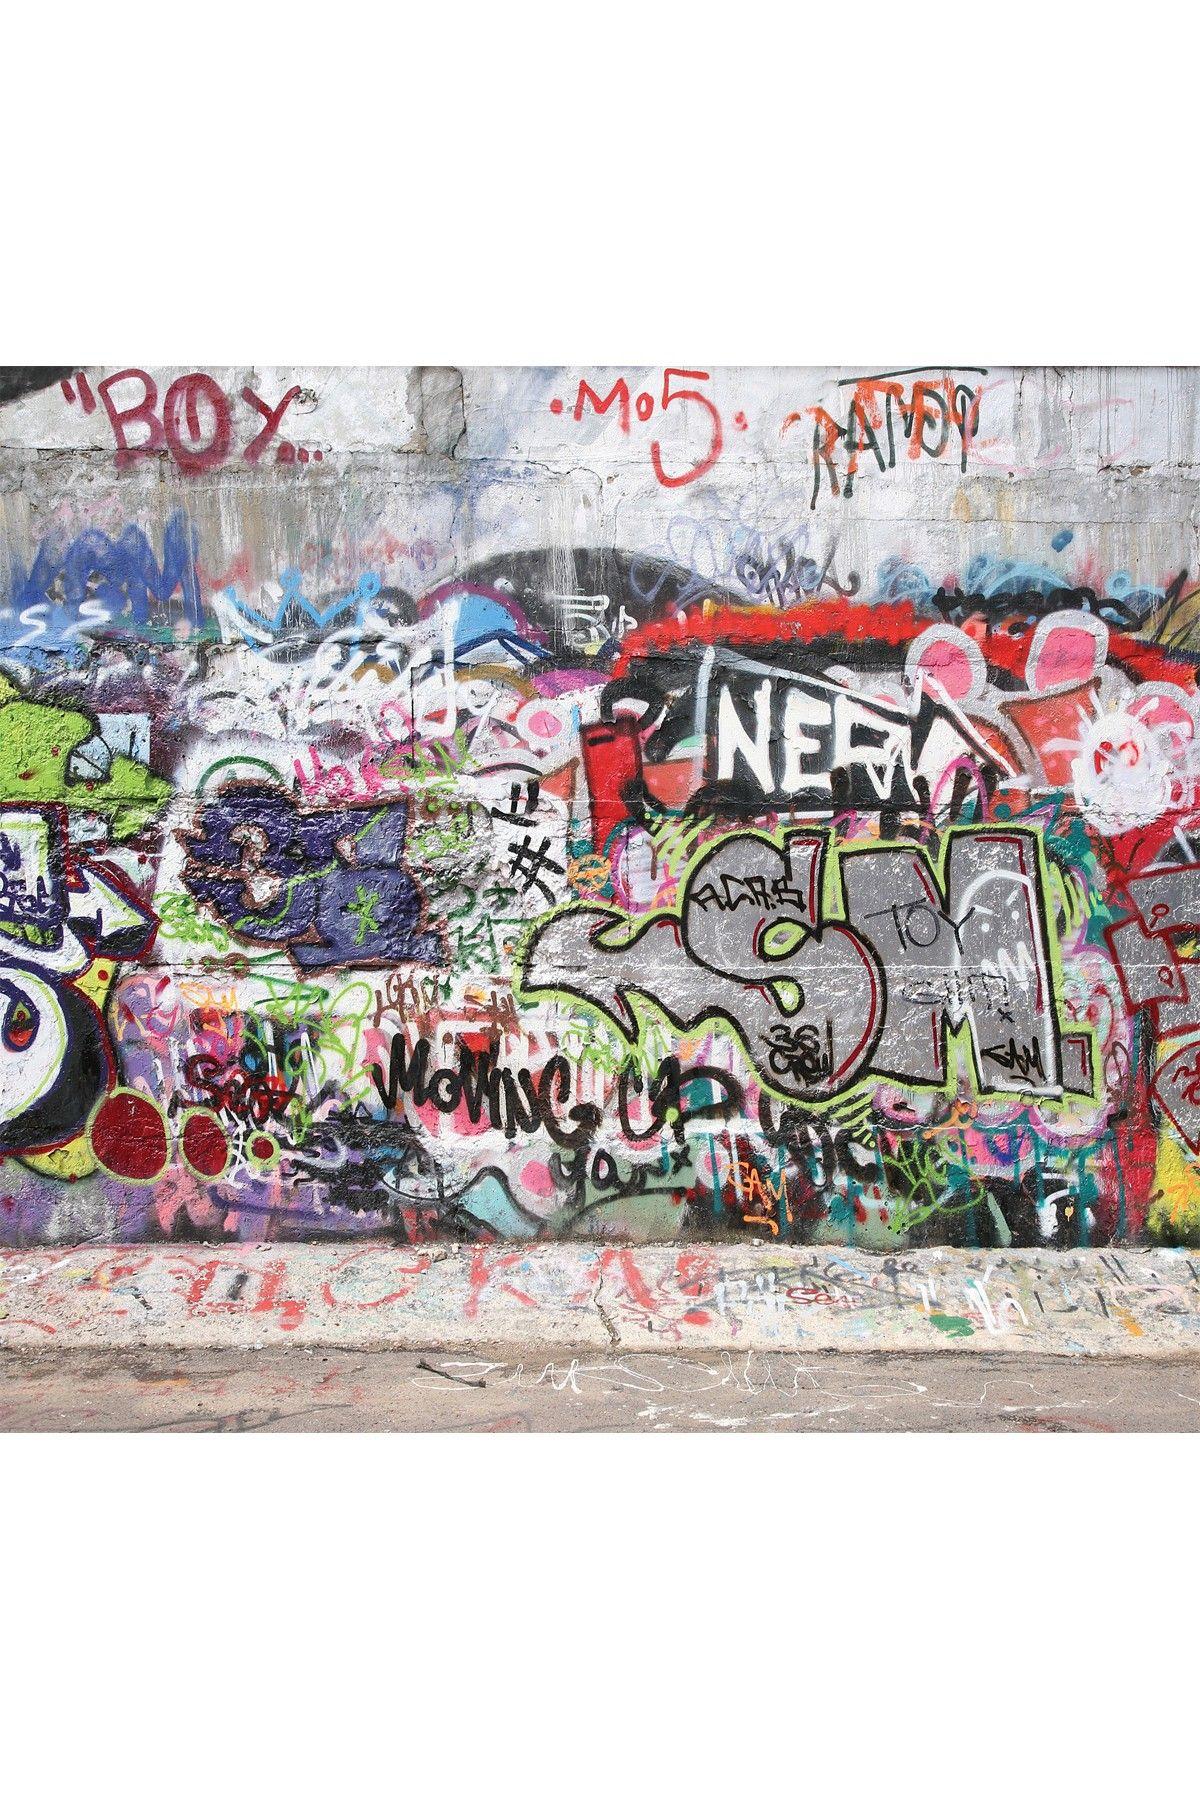 Red, White and Blue Graffiti Mural Wallpaper Wall art